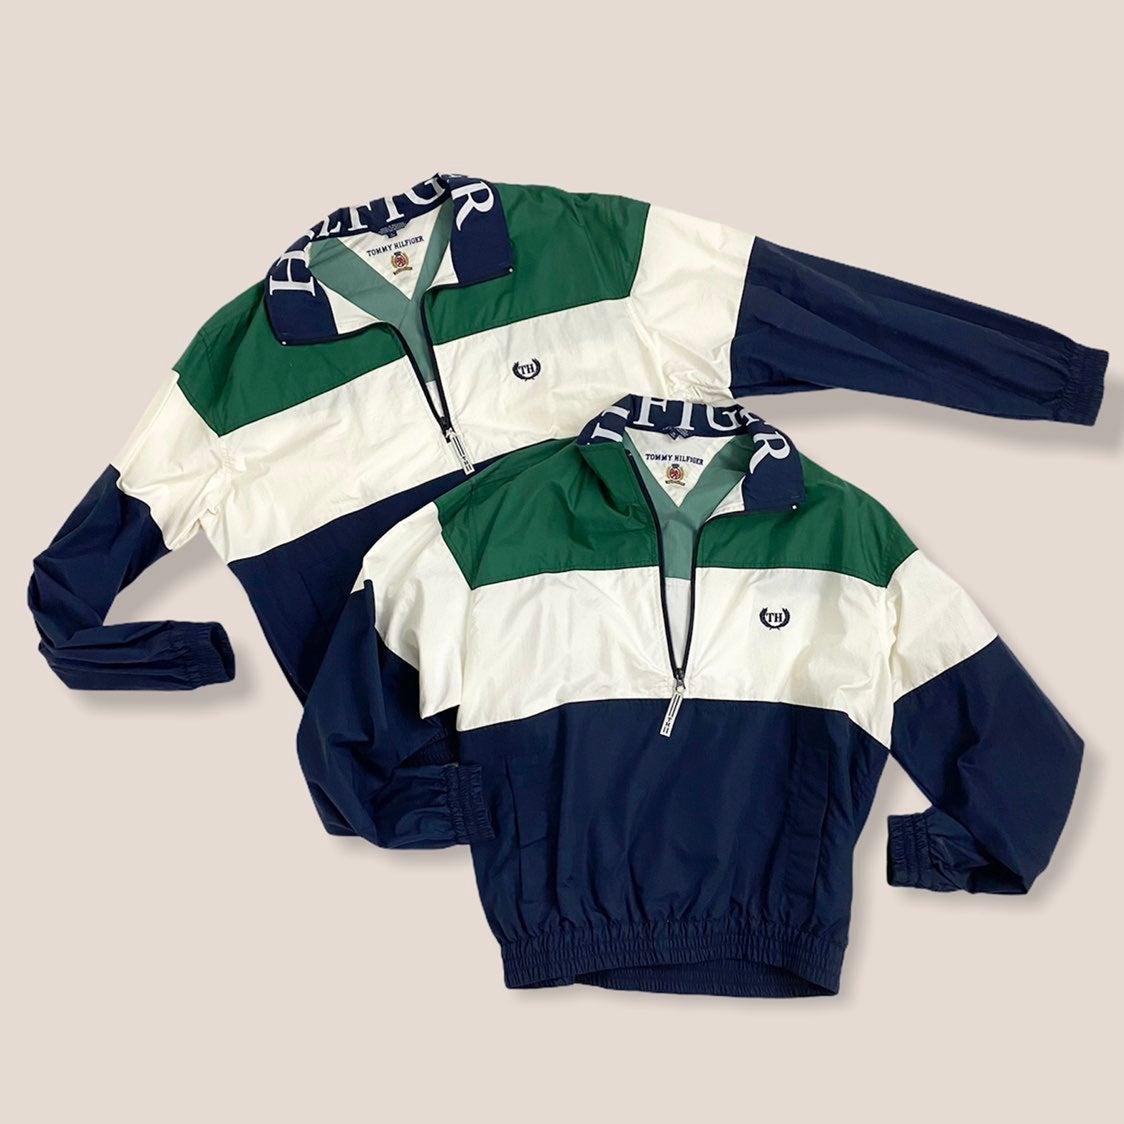 Vintage Tommy Hilfiger Spell Out Jacket